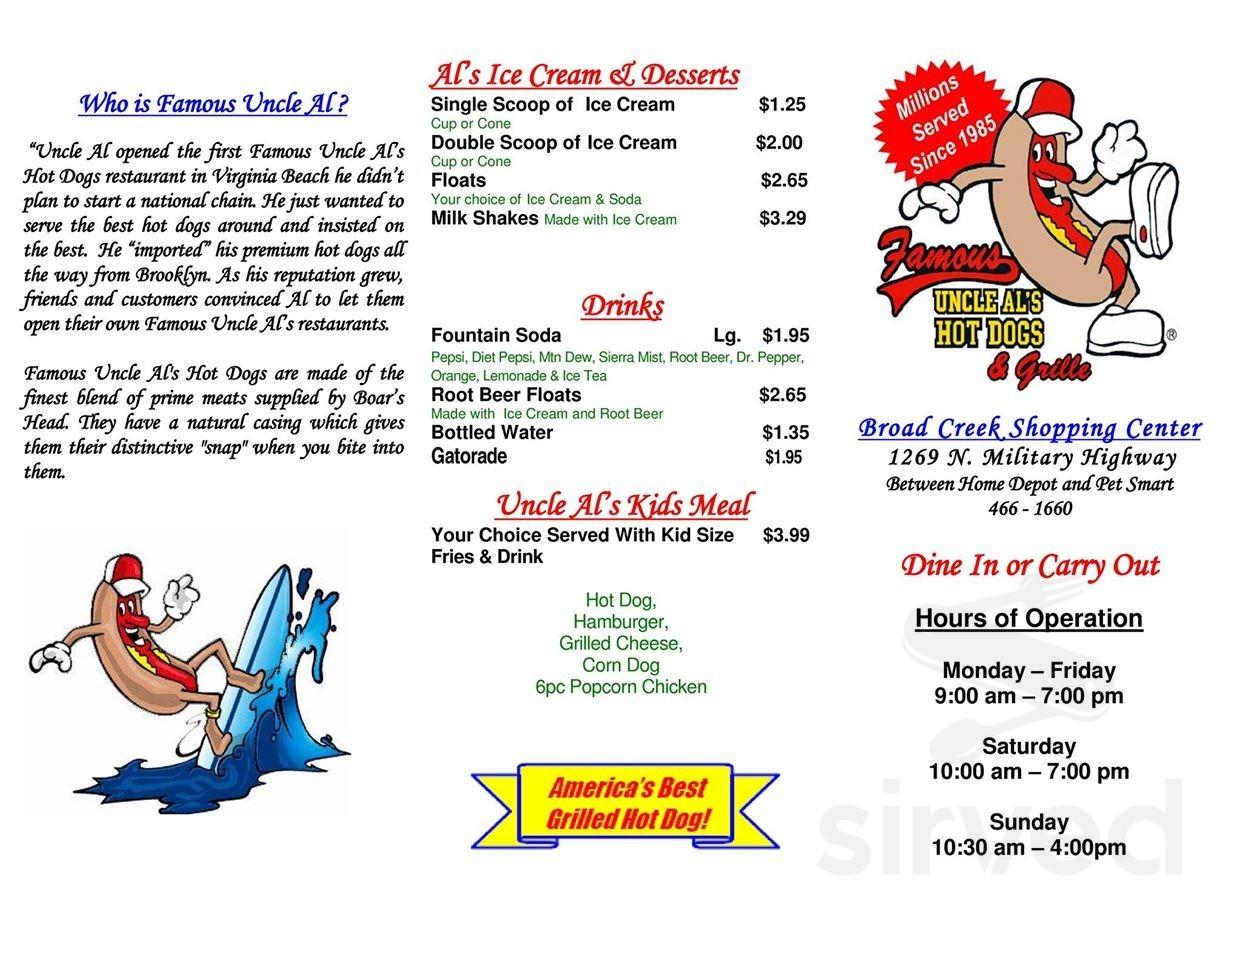 Menu for Famous Uncle Al's Hotdogs in Norfolk, Virginia